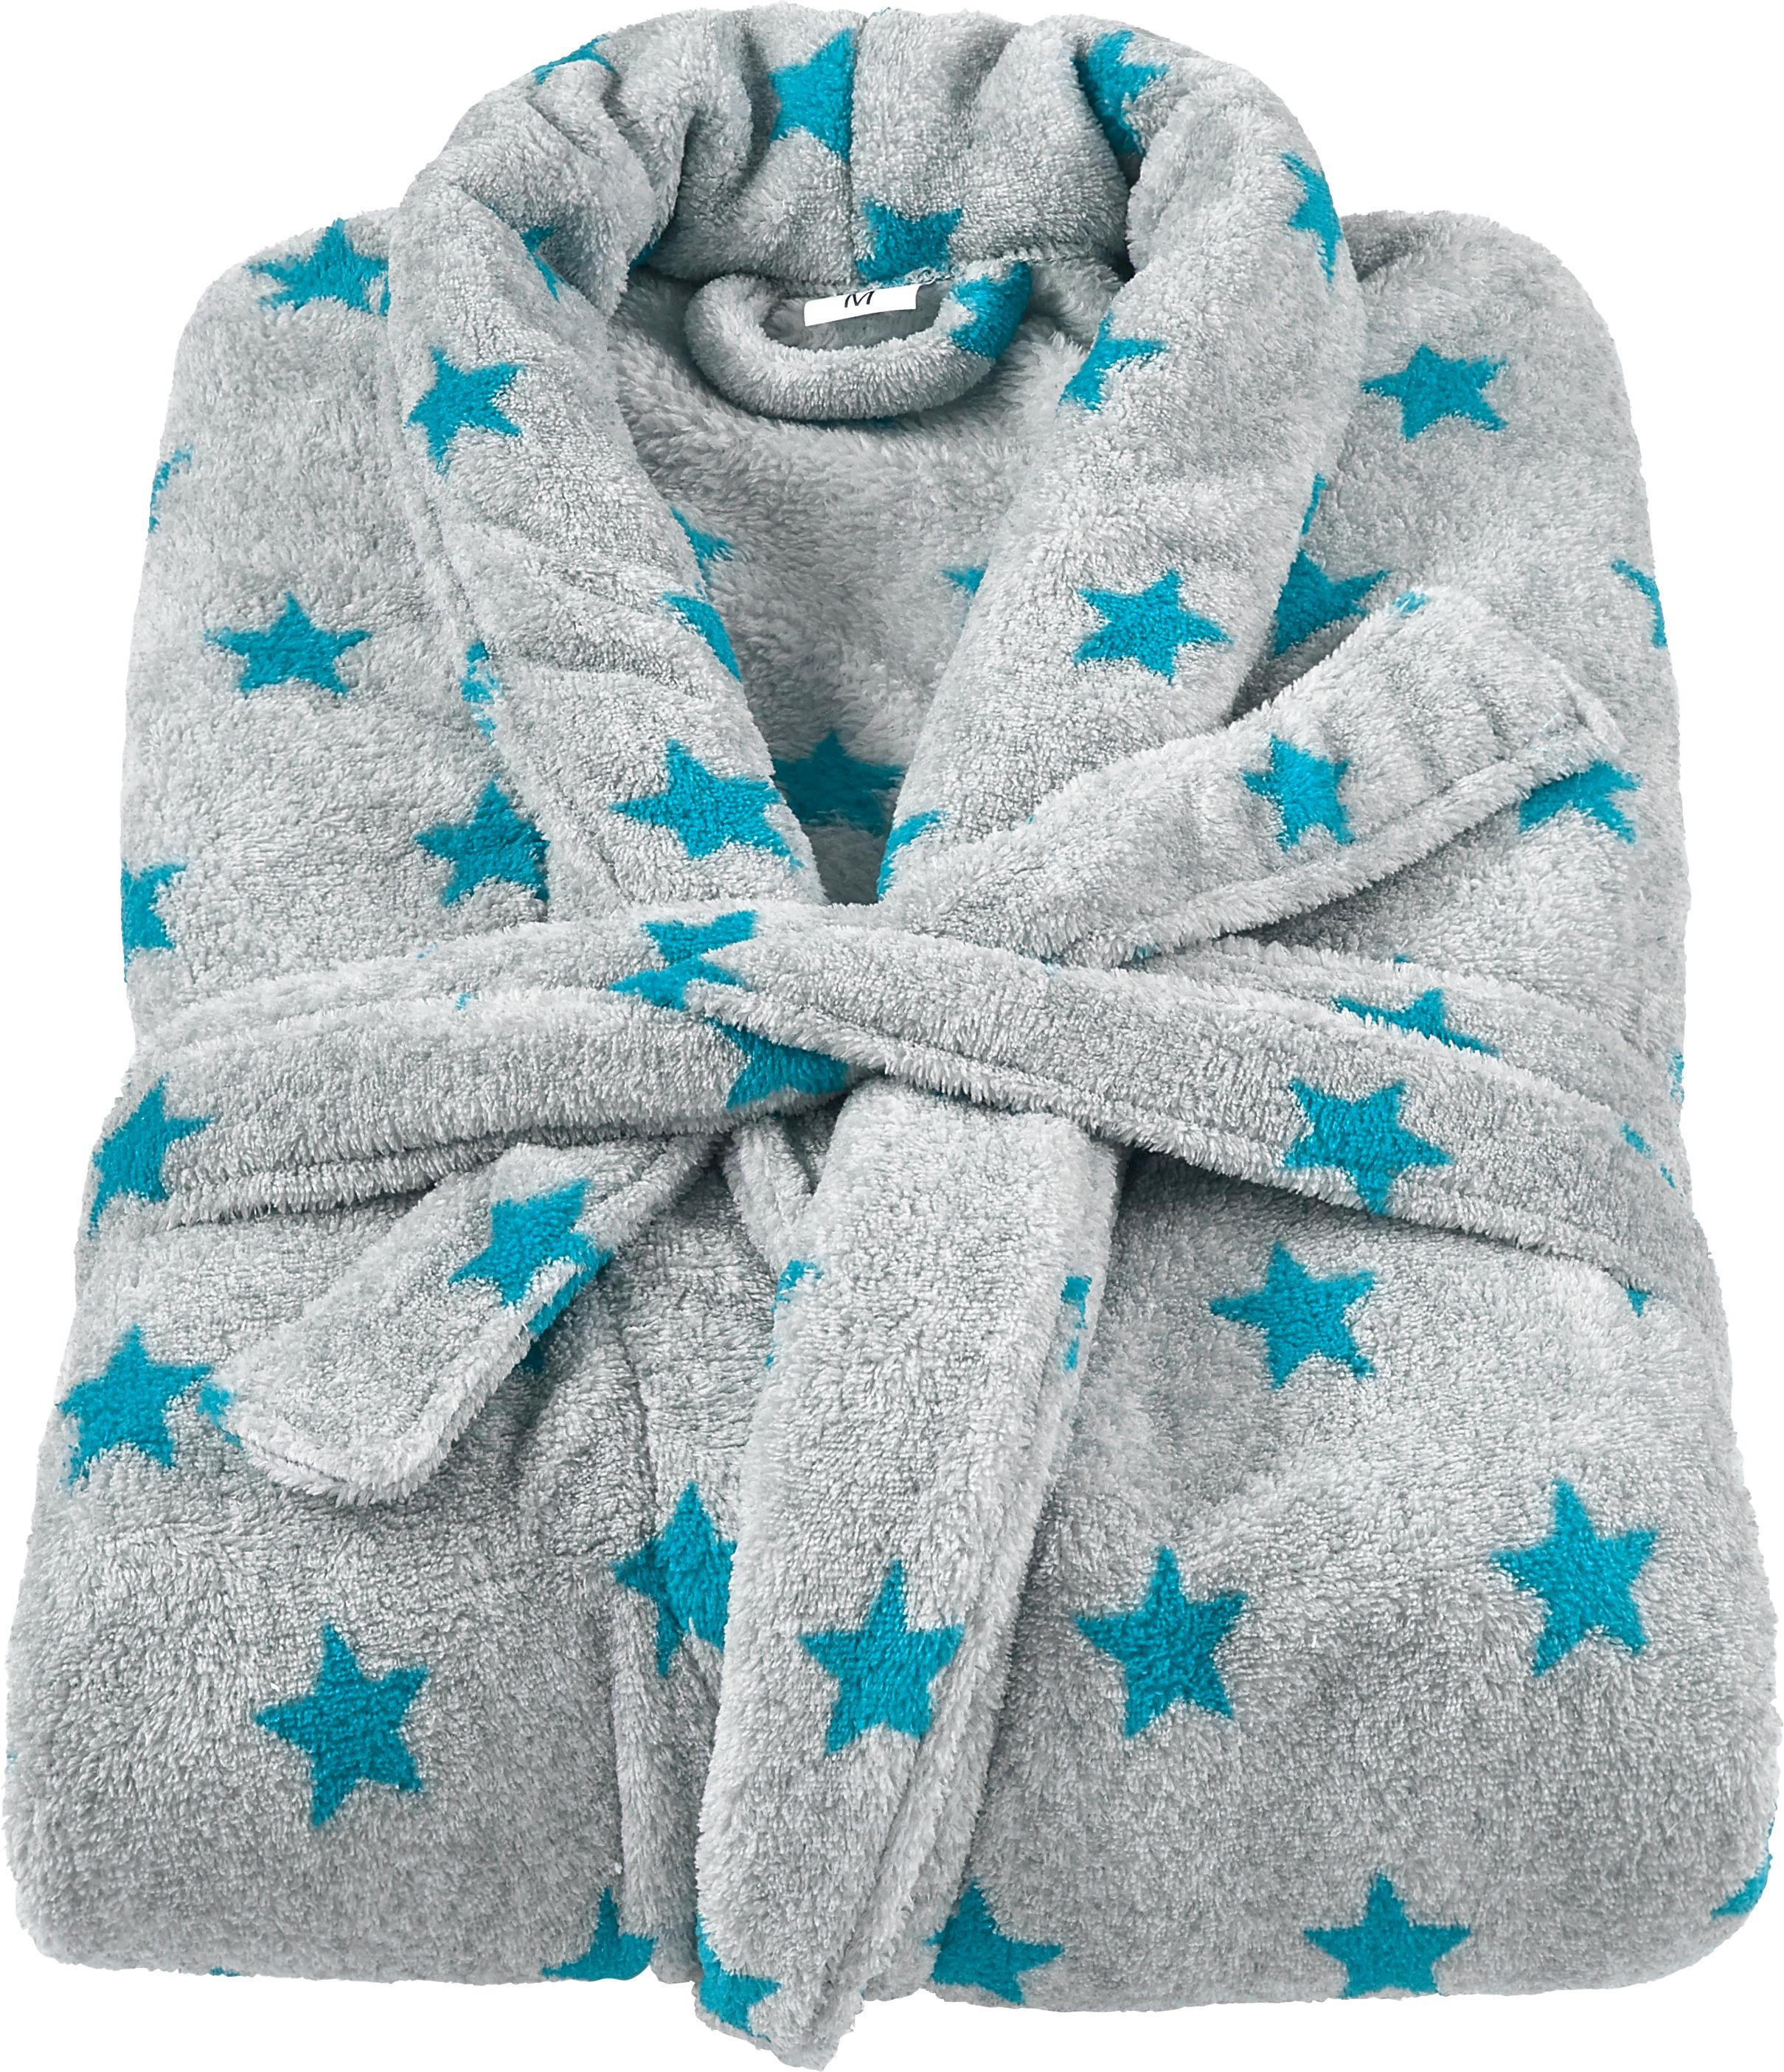 Bademantel Sterne in Grau mit Sternen - Petrol/Grau, Textil (S-L) - MÖMAX modern living